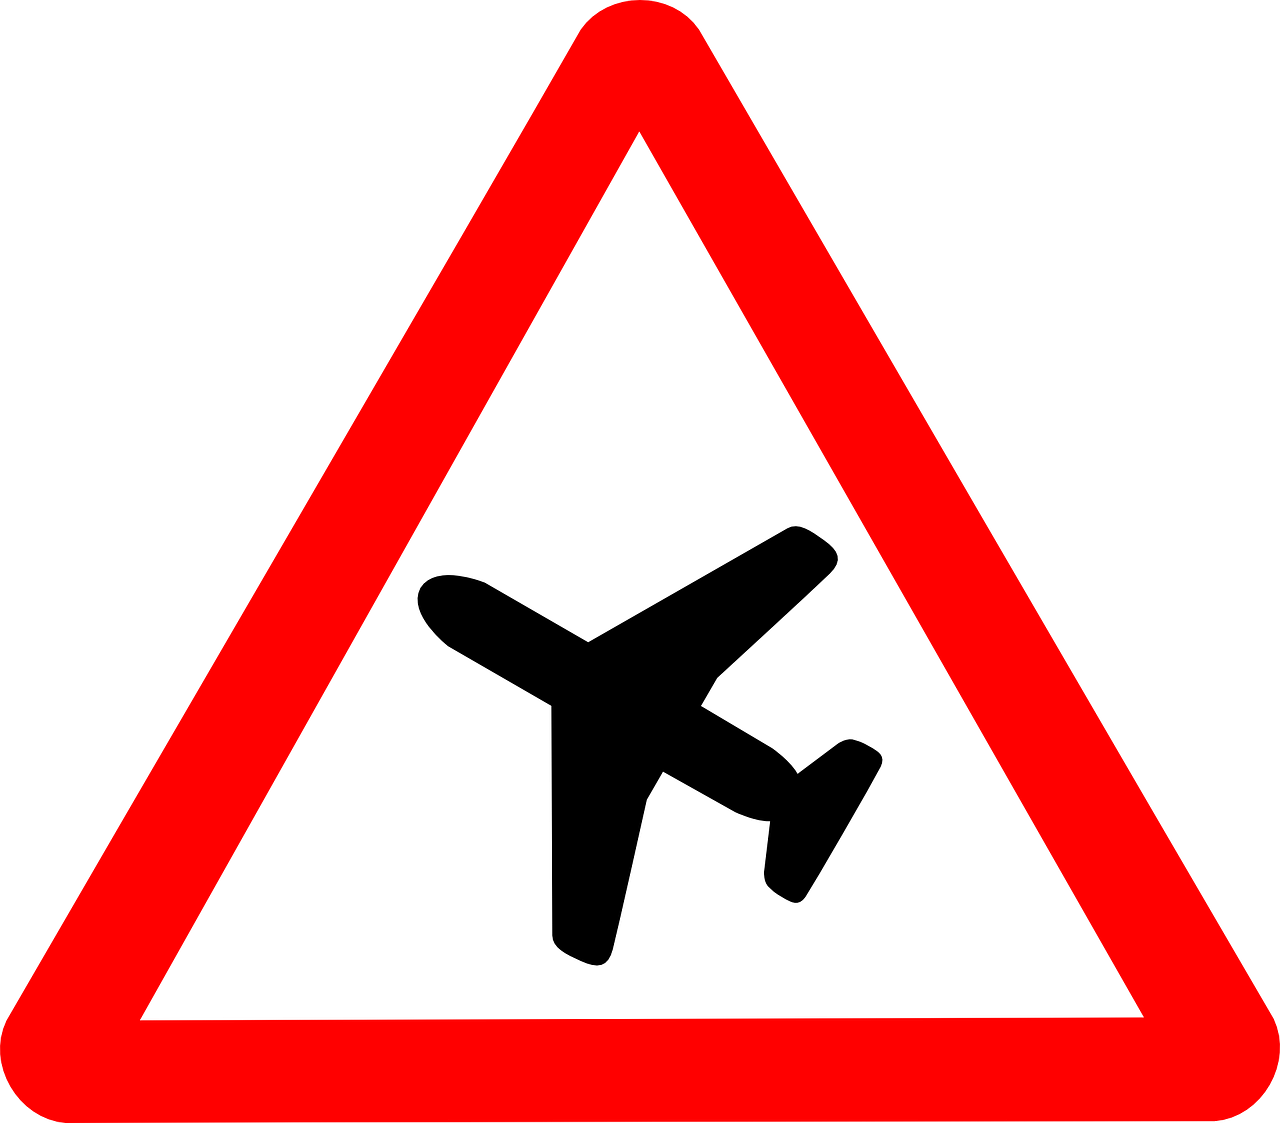 GRÜNE Stellungnahme zum Verkehrslandeplatz Speyer